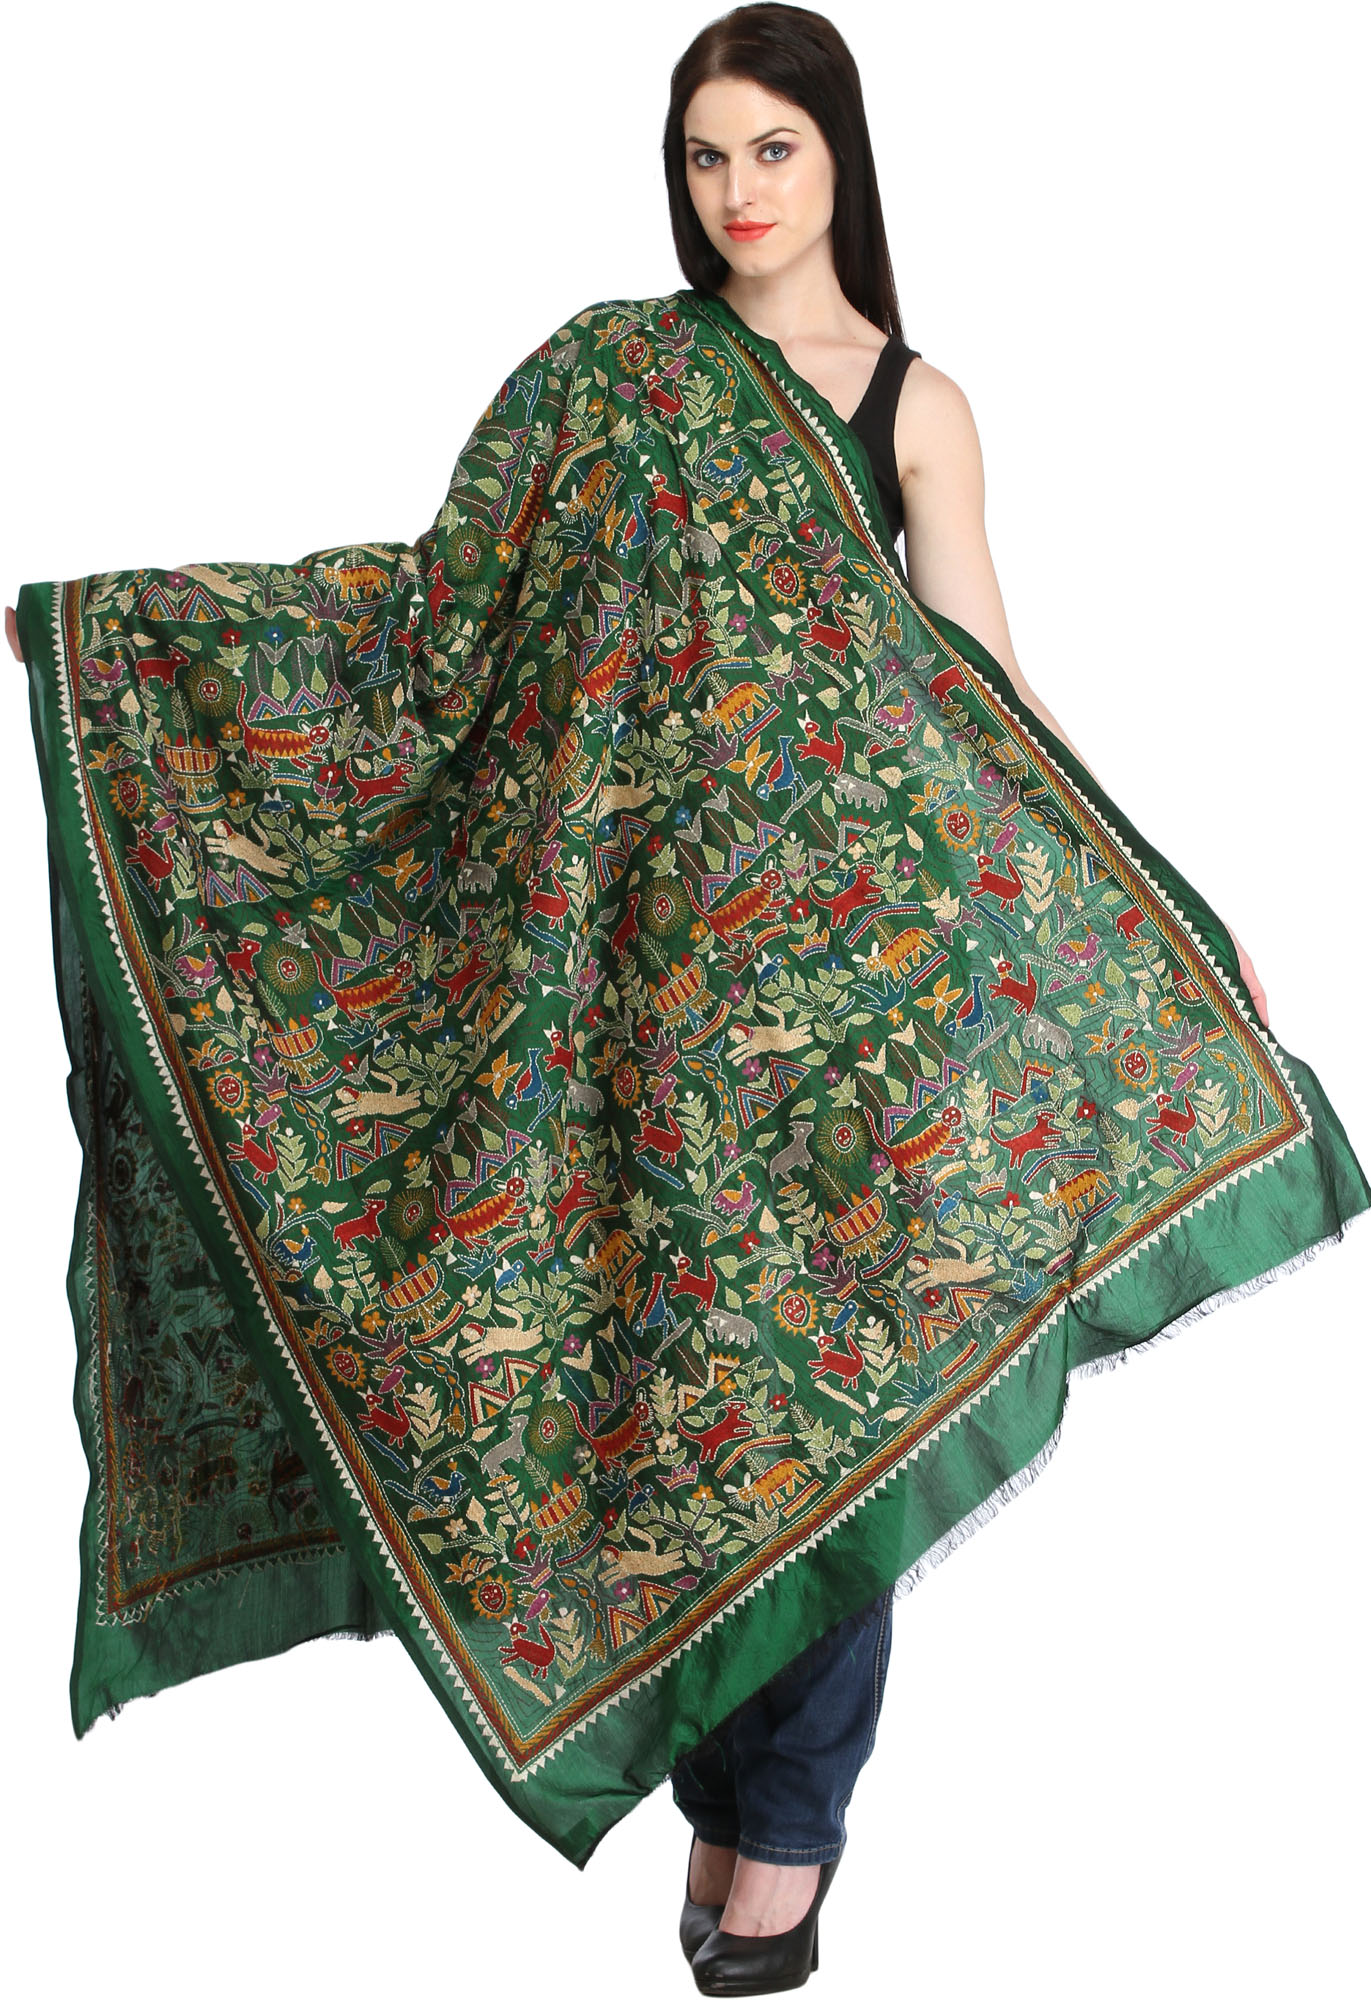 Foliage green kantha hand embroidered dupatta from kolkata